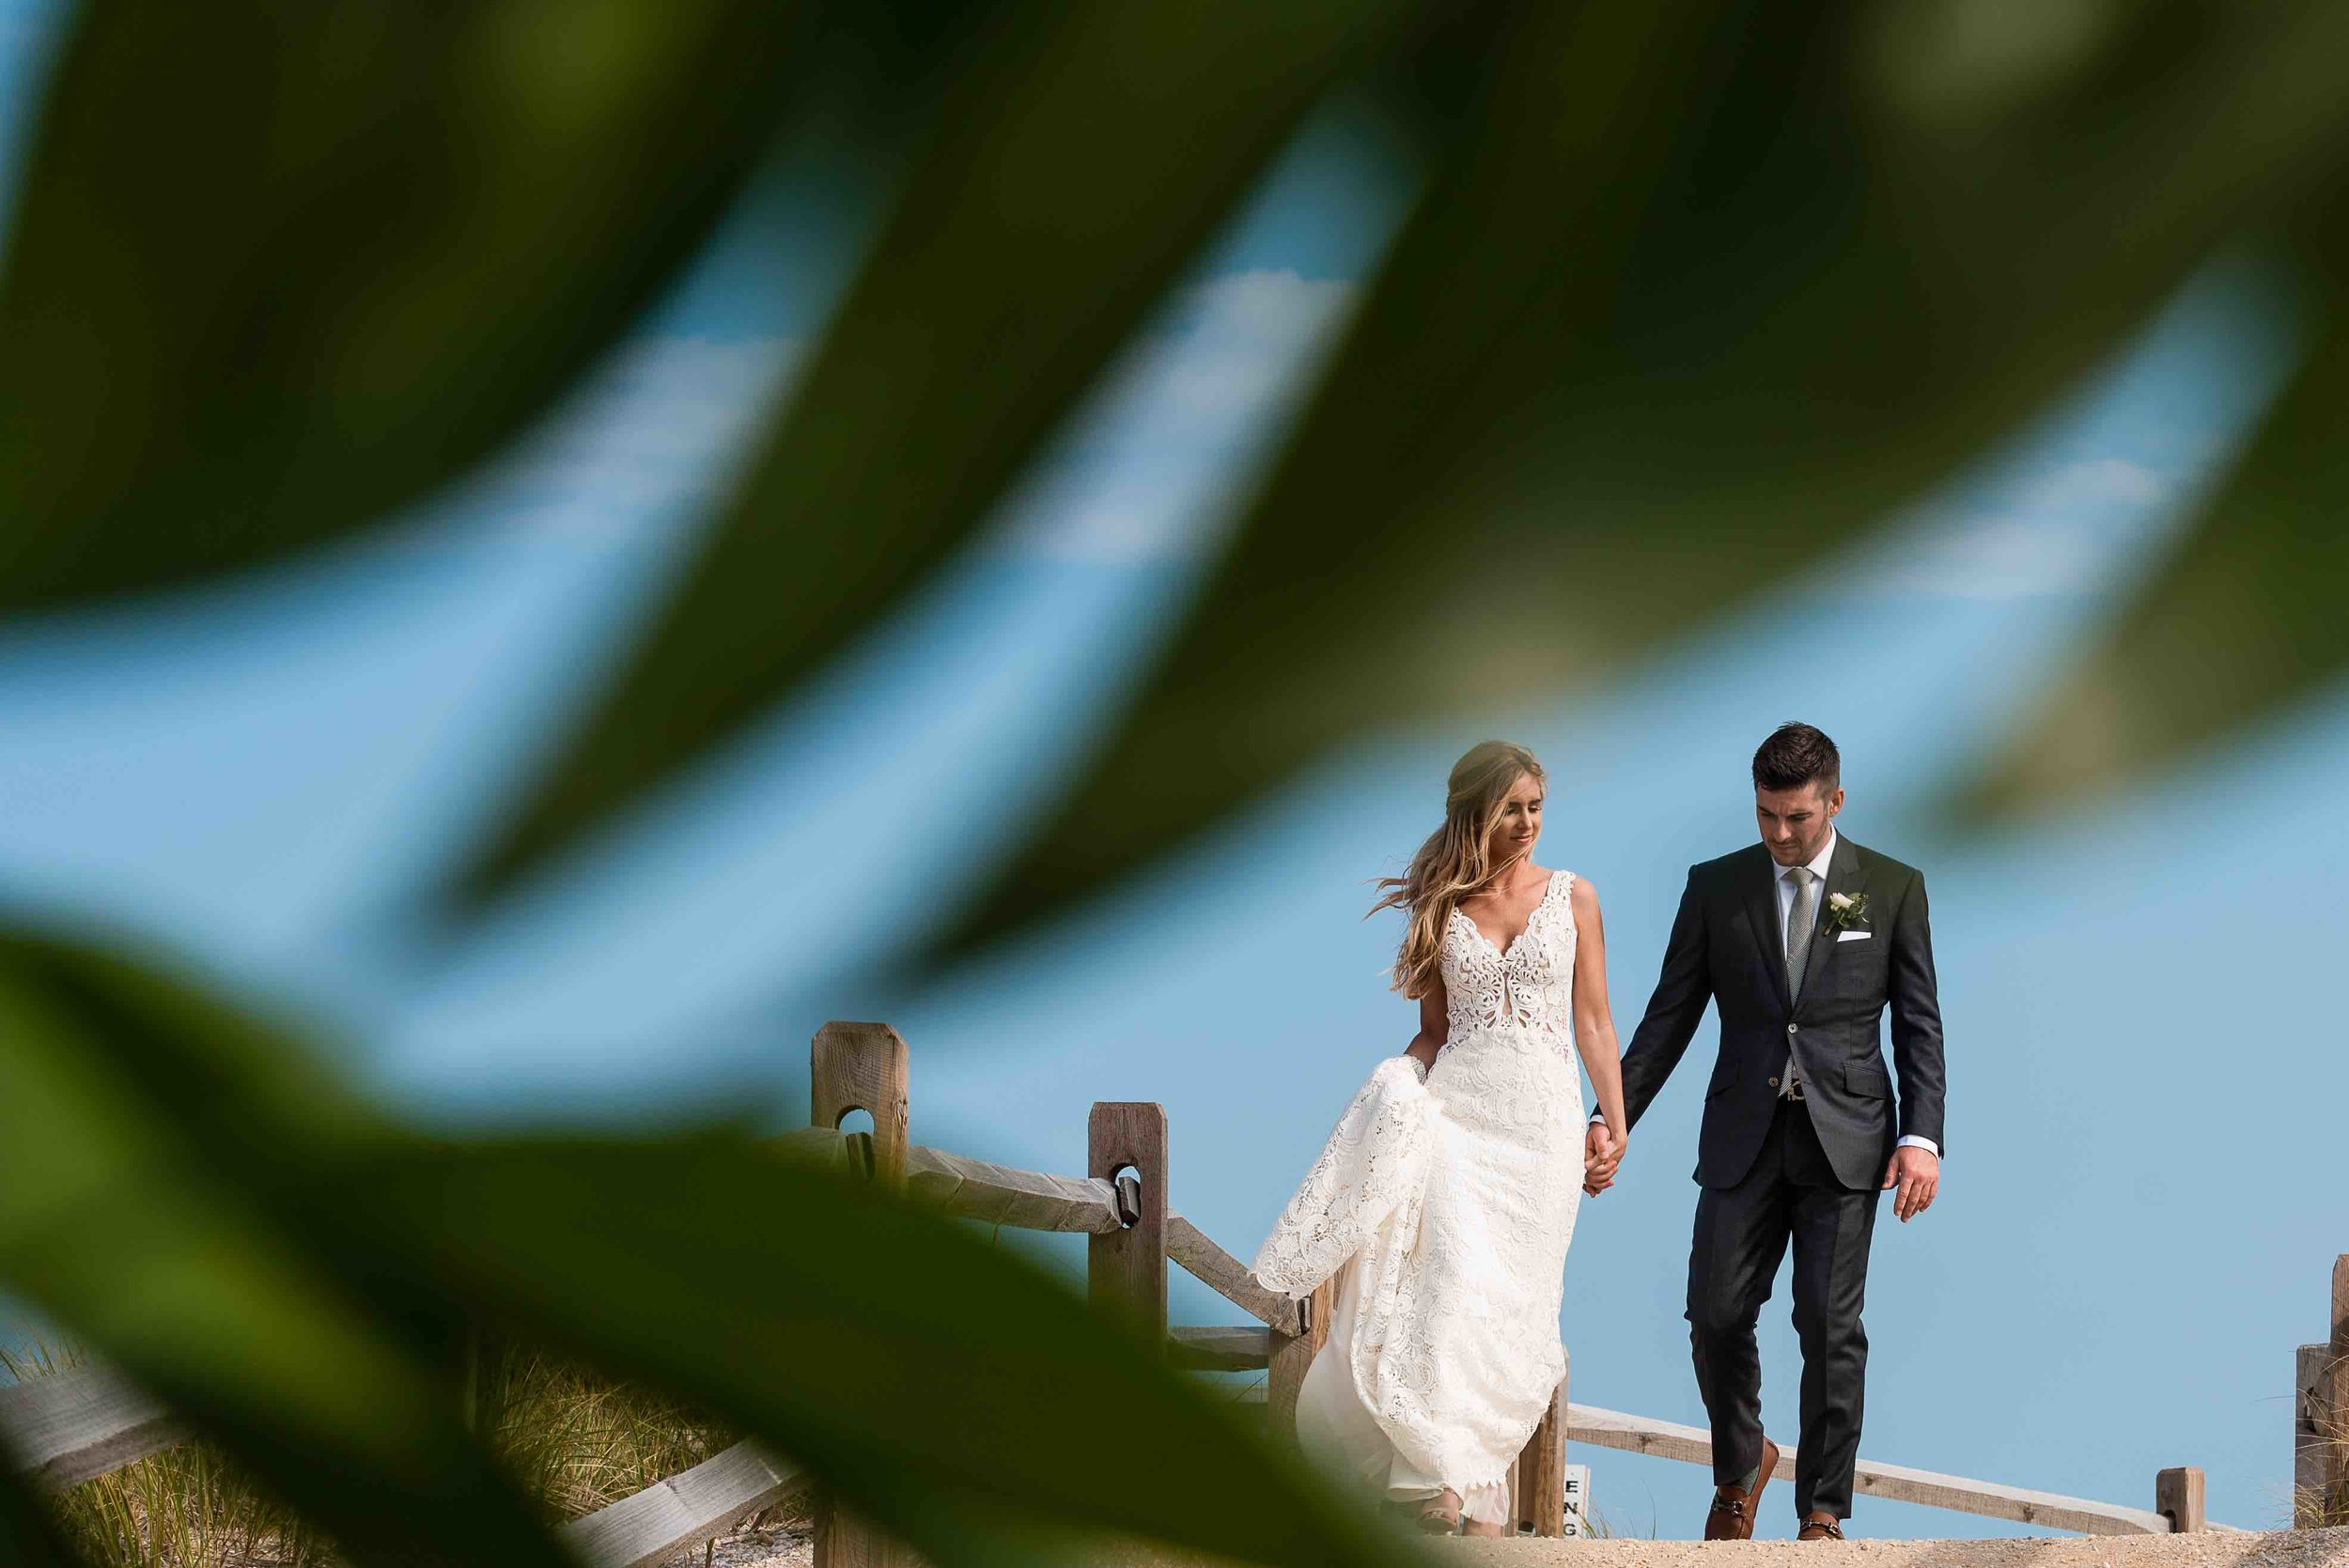 LBI-Shell-fitzpatrick-wedding.jpg